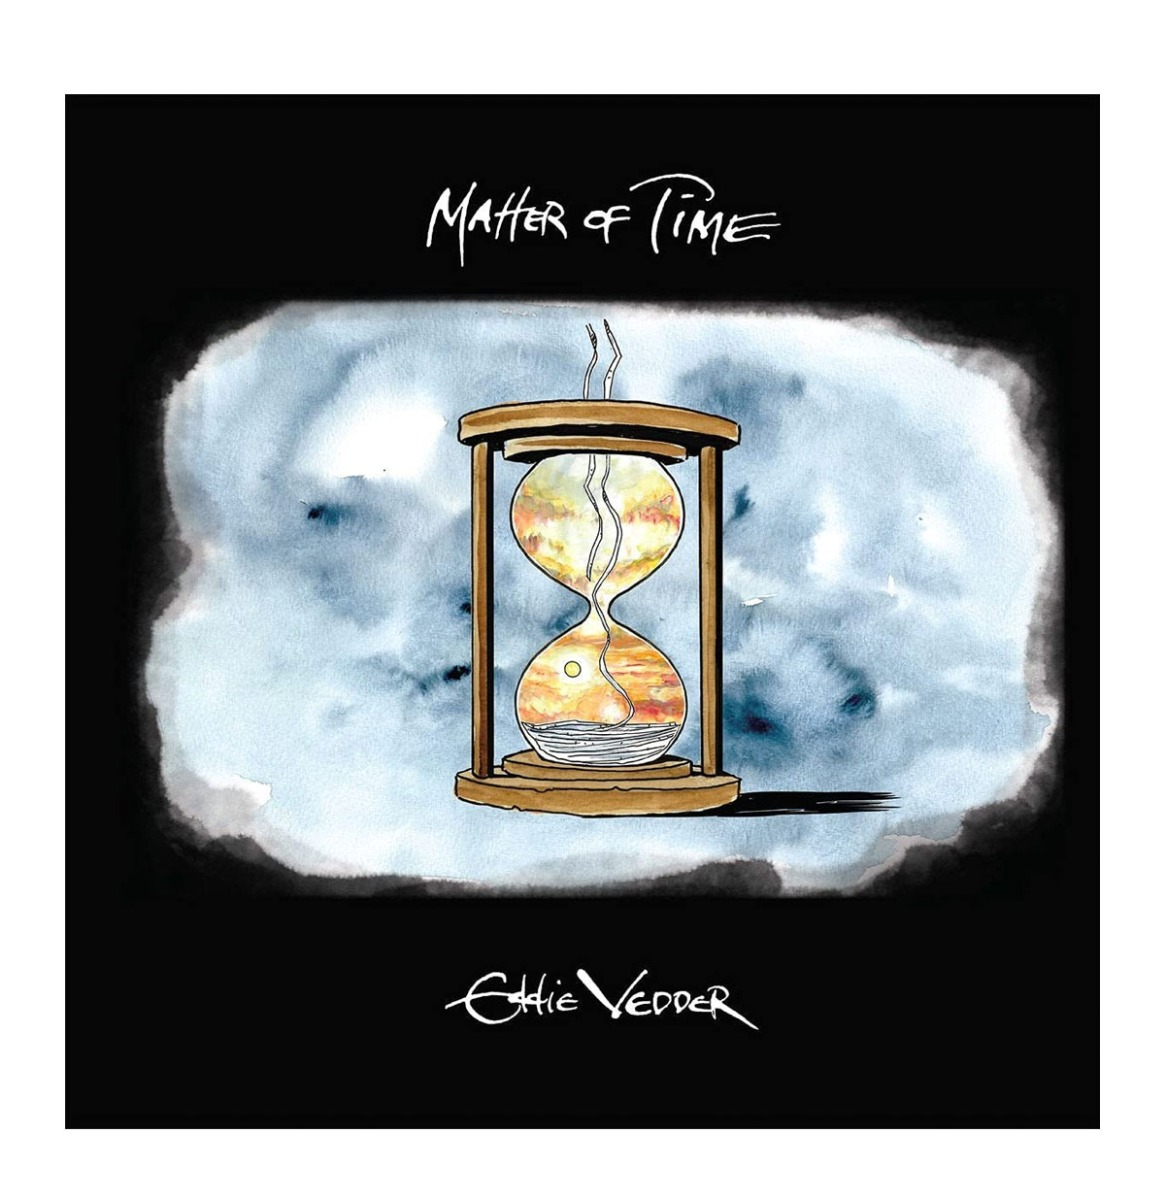 Eddy Vedder - Matter of Time Gelimiteerde Oplage 7 Inch Single